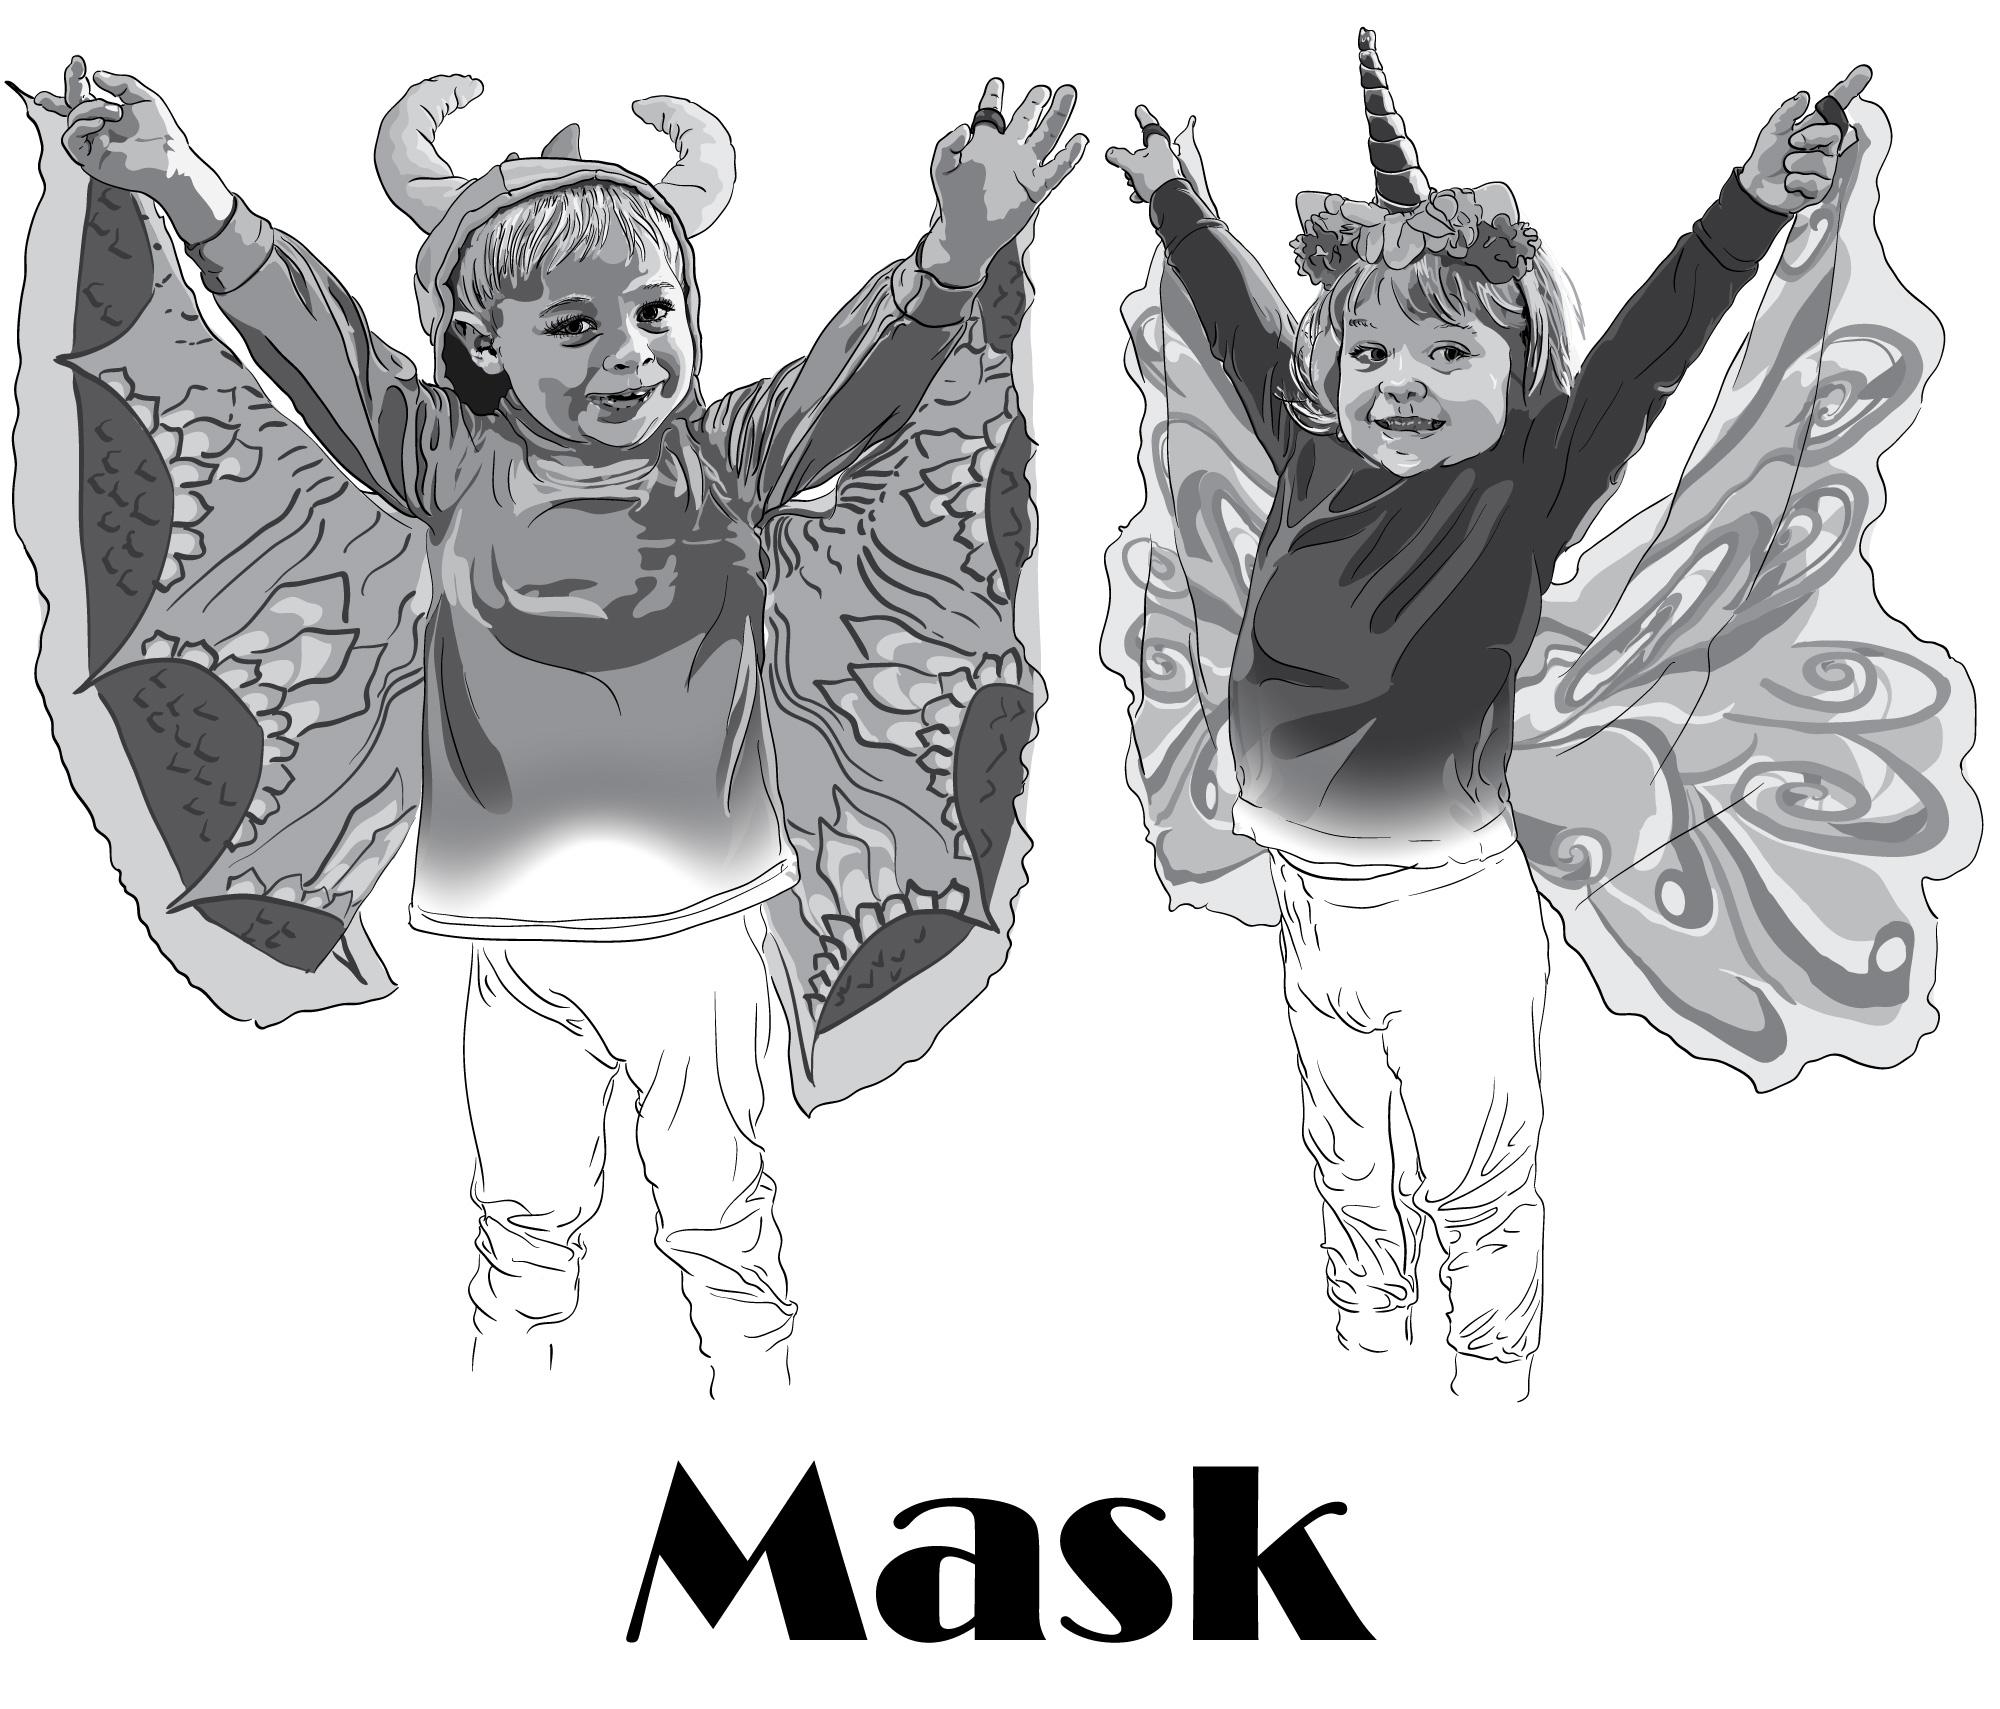 31-Mask.jpg